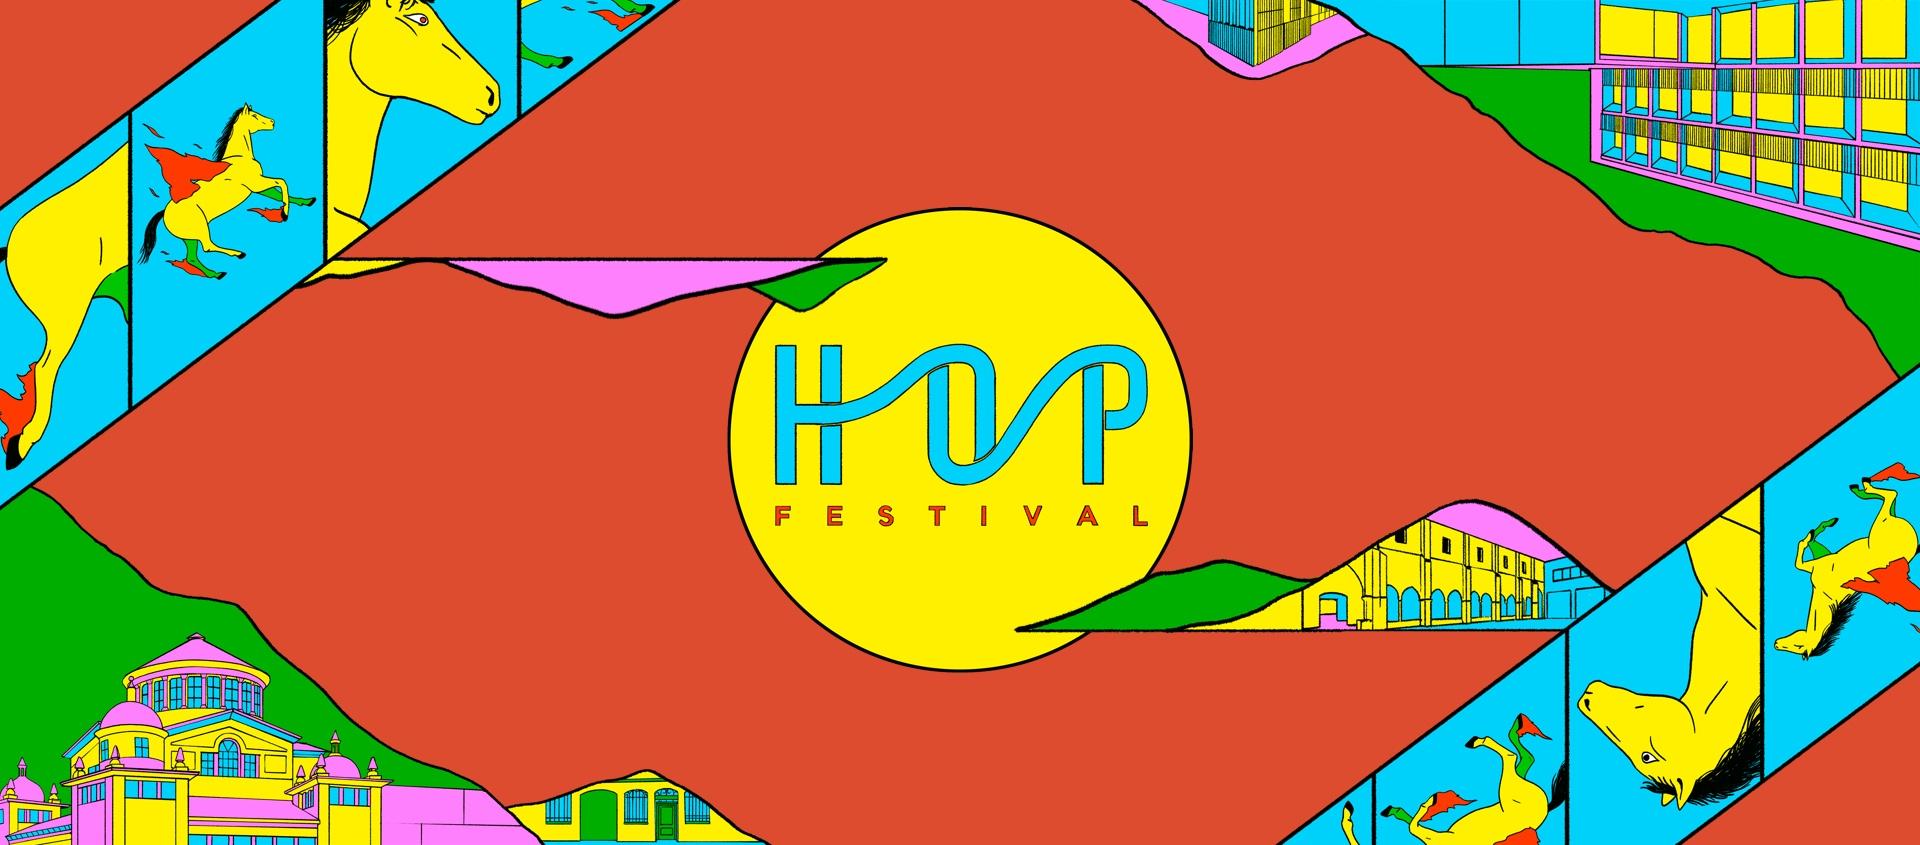 HOP festival poster